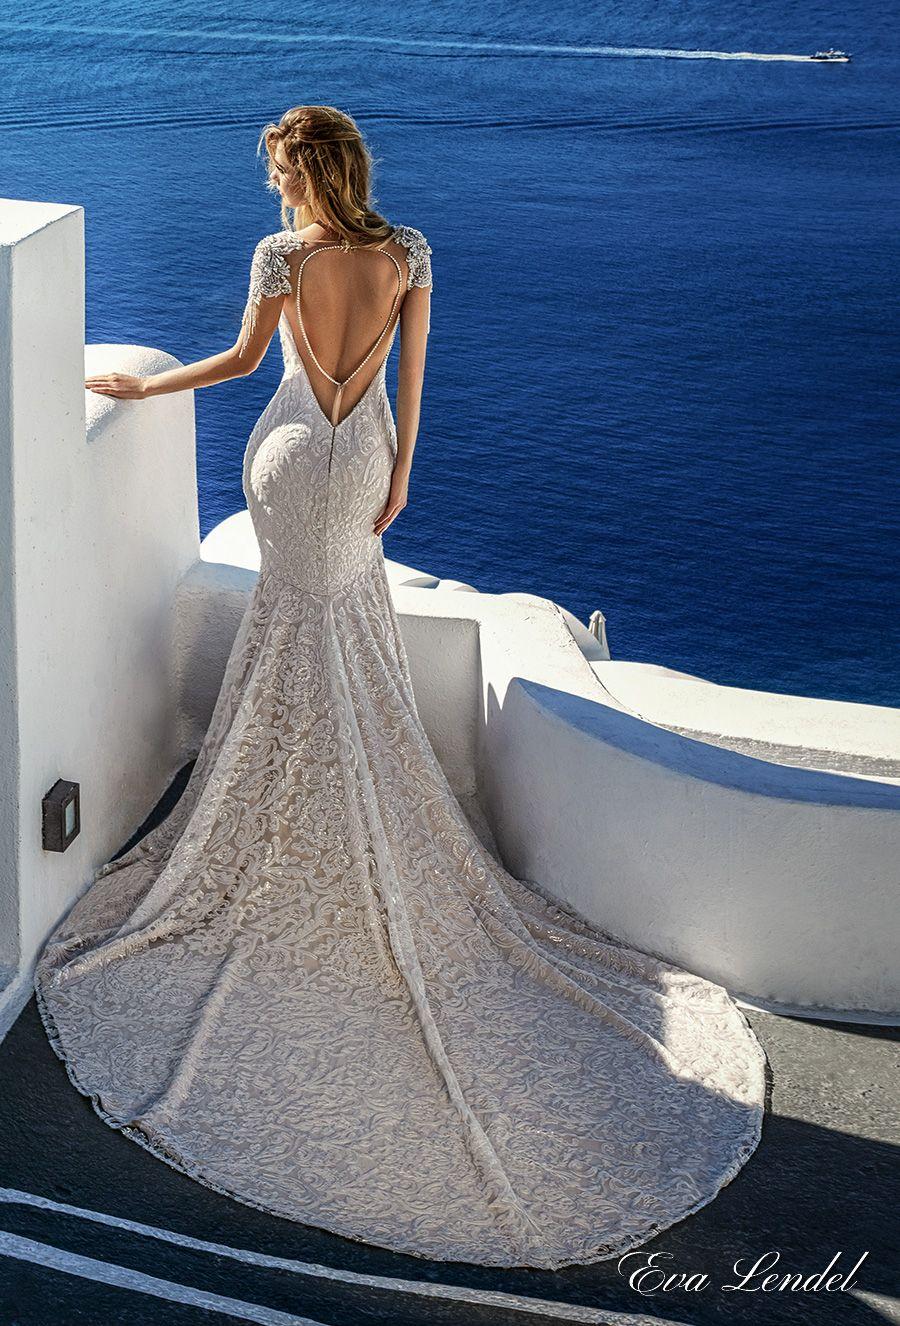 Eva lendel wedding dresses u ucsantoriniud bridal campaign